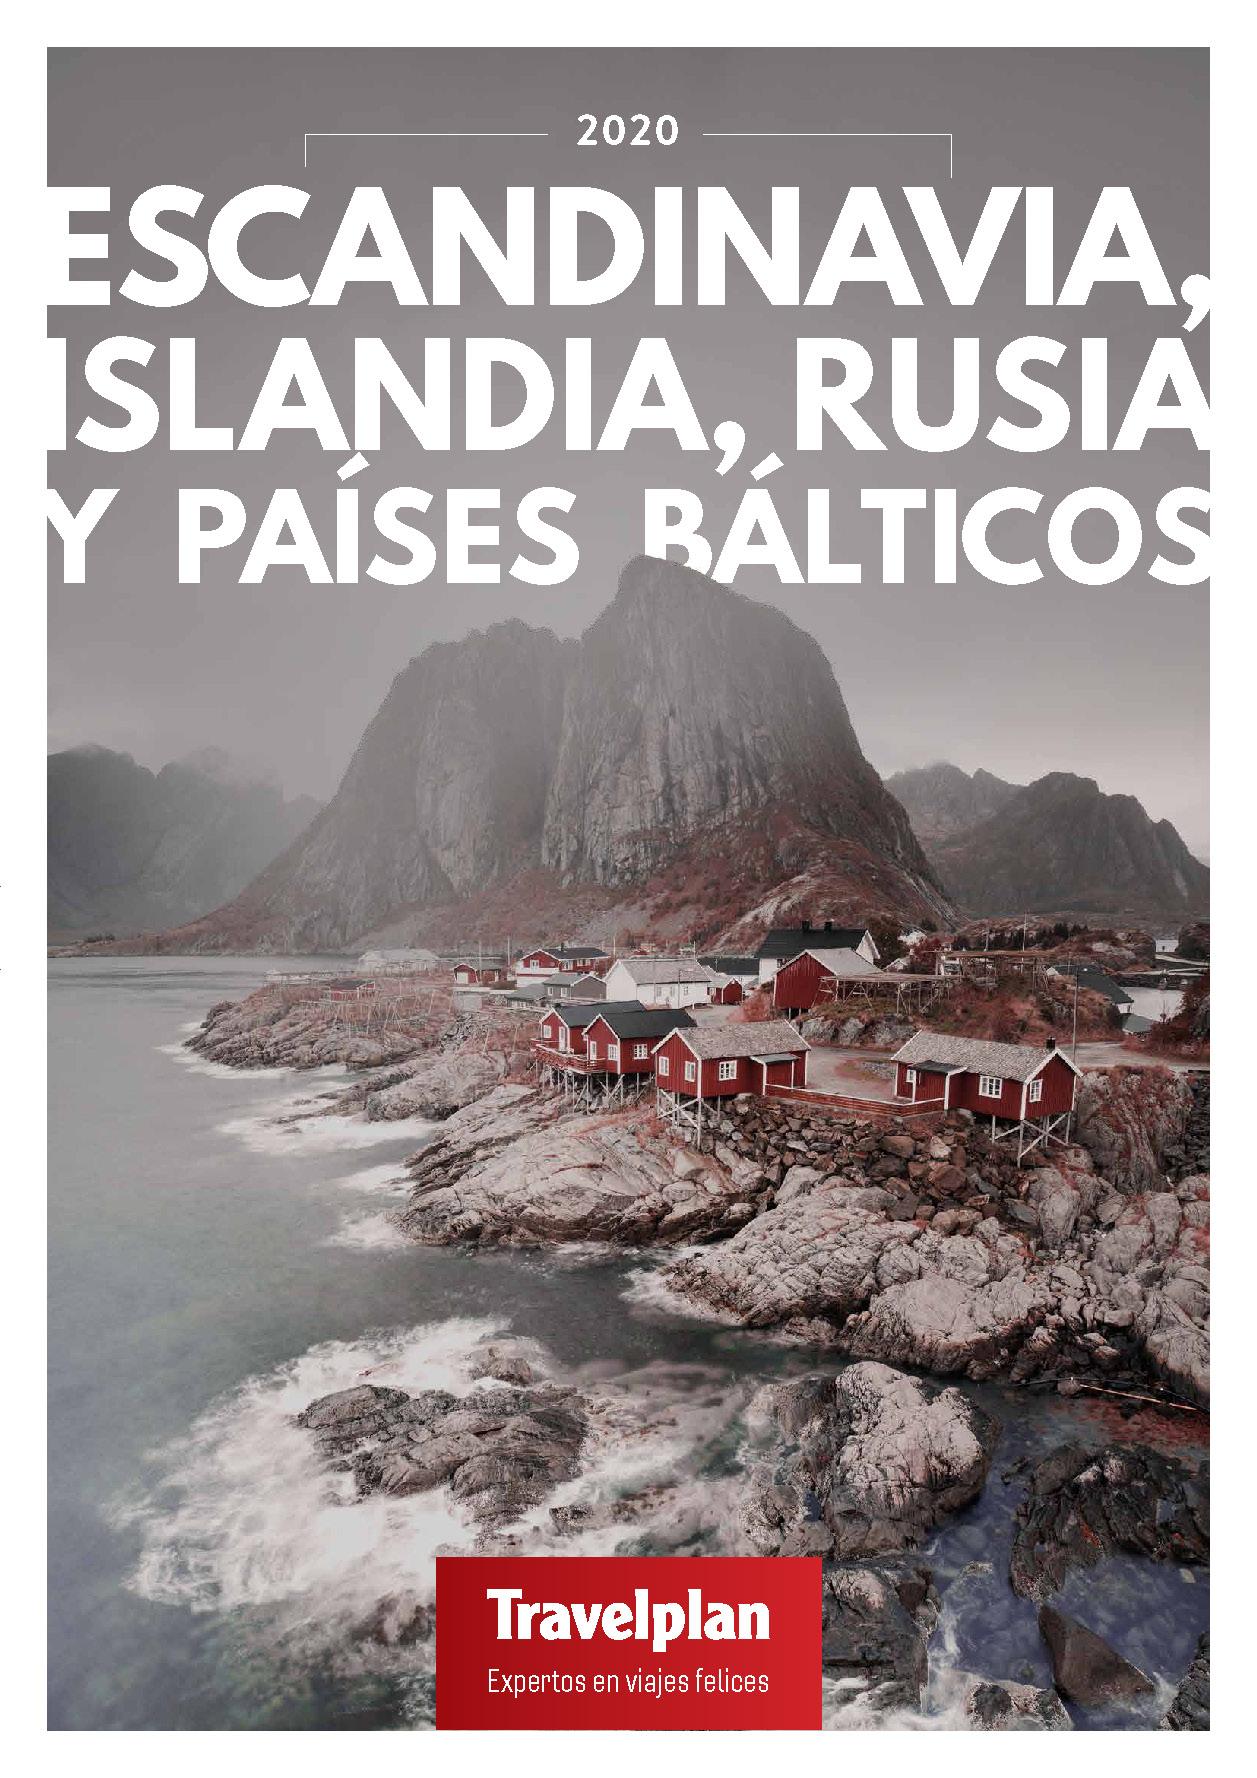 Catalogo Travelplan Escandinavia Islandia y Rusia 2020